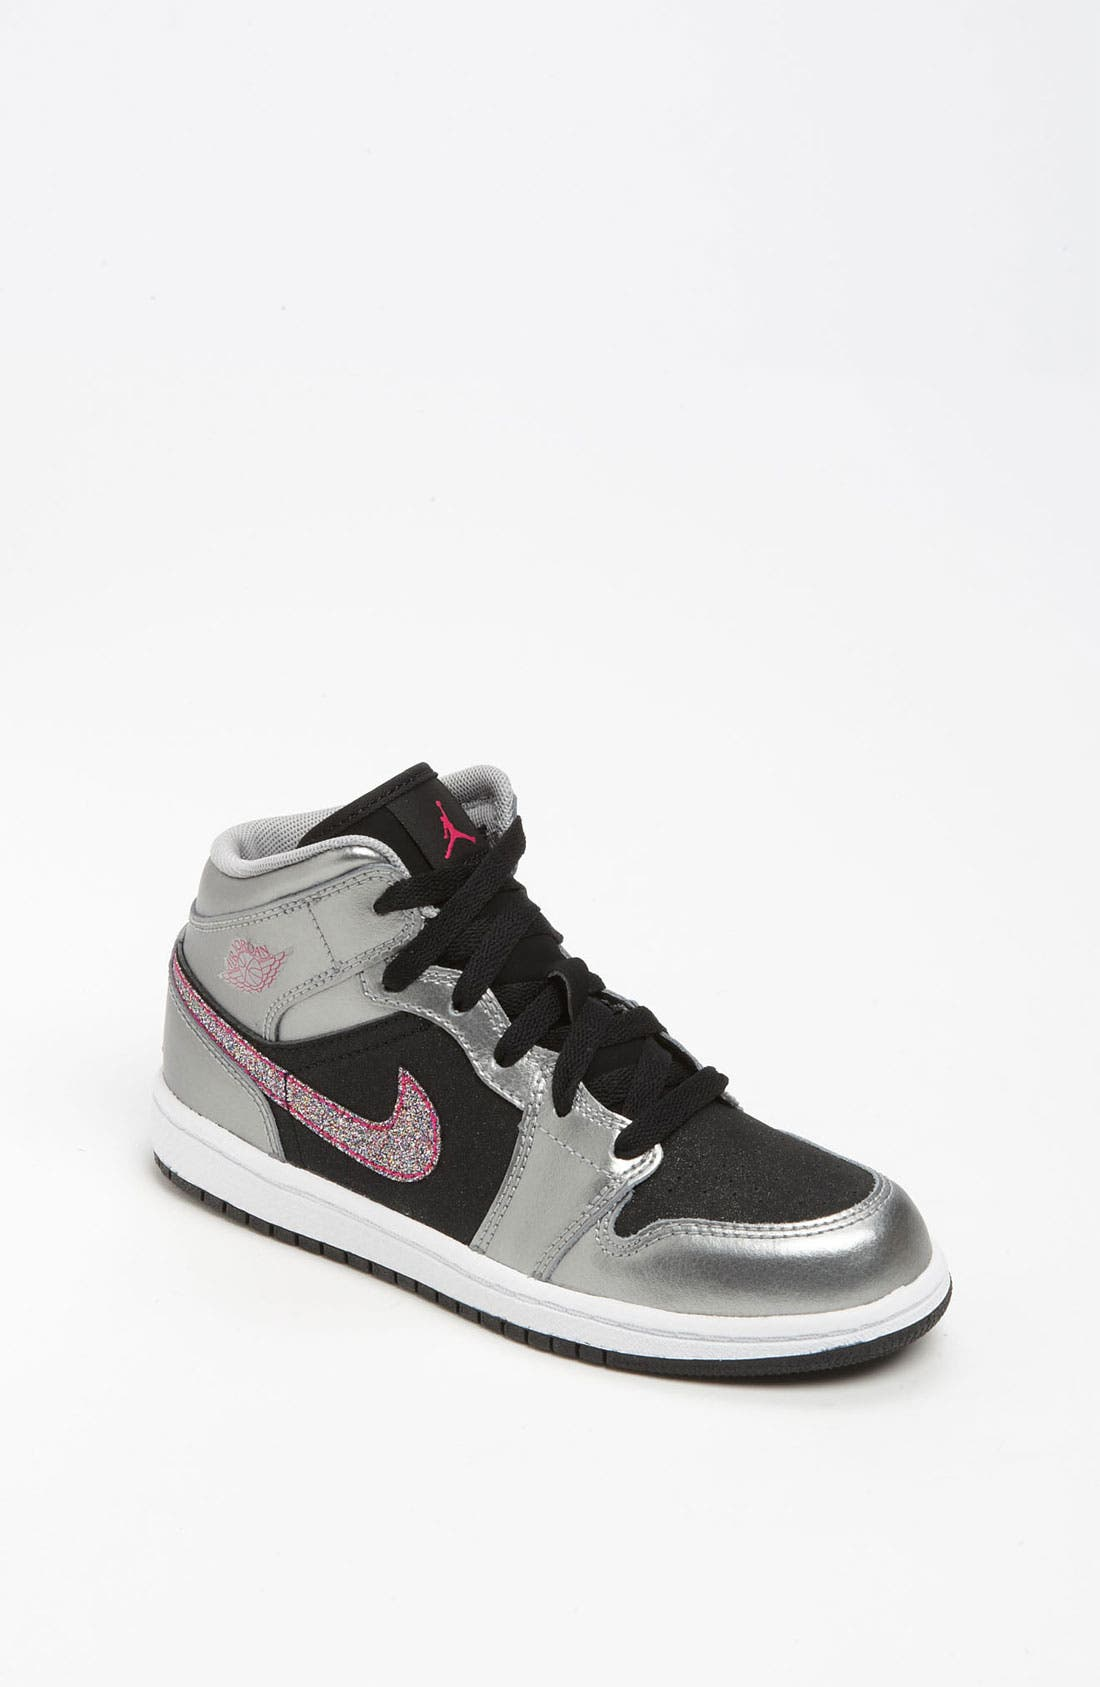 Main Image - Nike 'Jordan 1 Phat' Sneaker (Toddler & Little Kid)